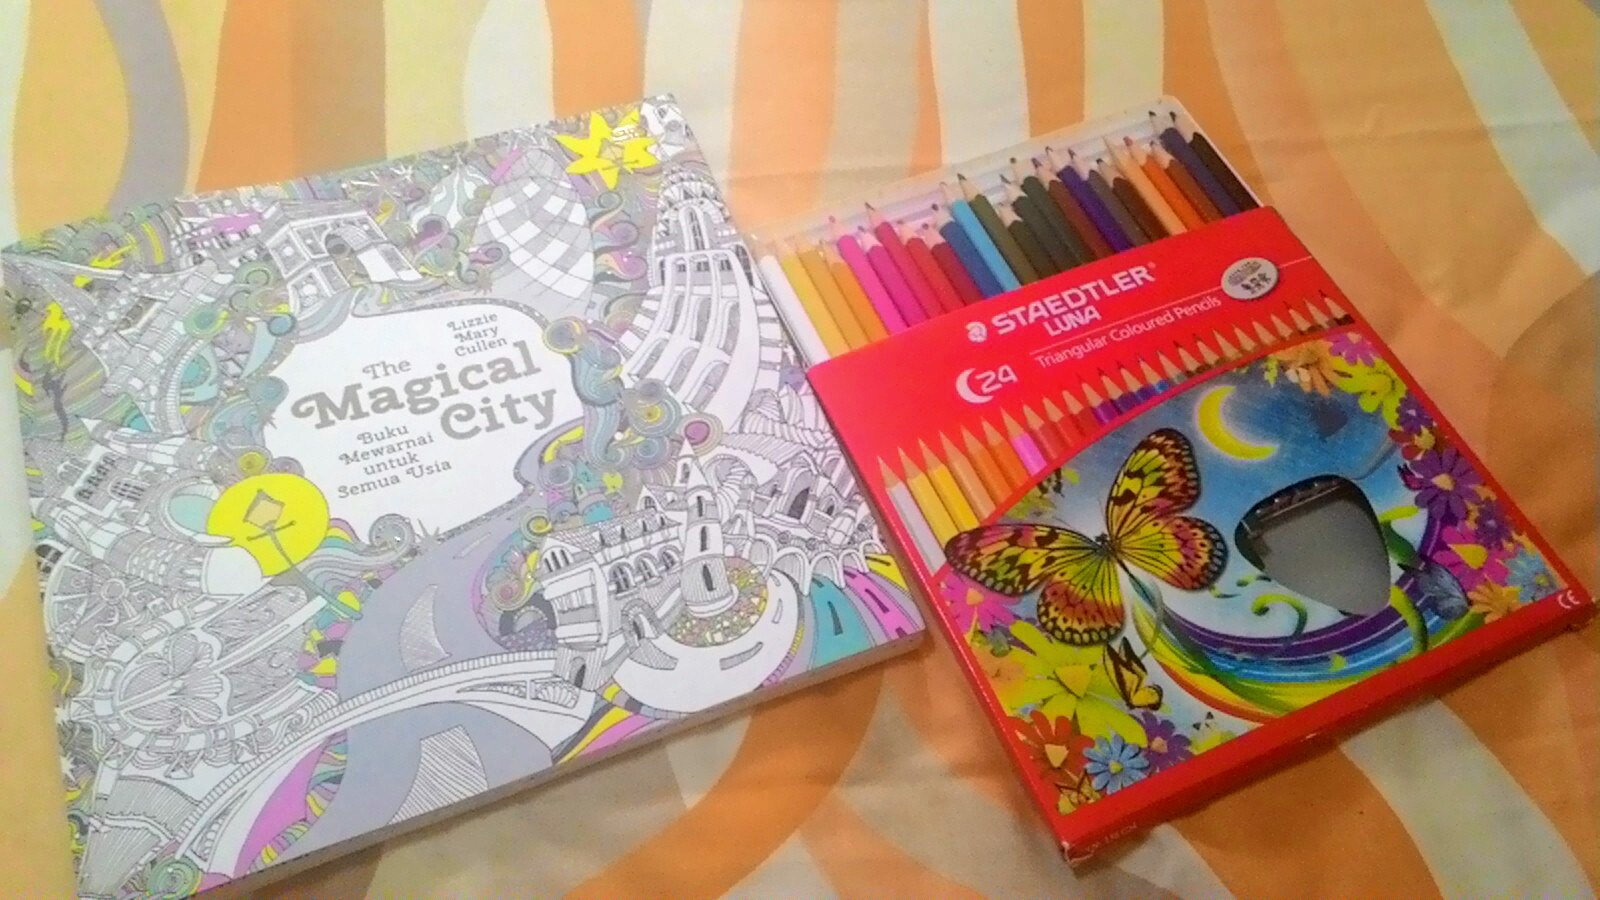 Coloring Book Judul The Magical City Penulis Lizzie Mary Cullen Penerbit Gramedia Pustaka Utama Tahun Terbit 2015 Halaman 96 Harga Rp 99000